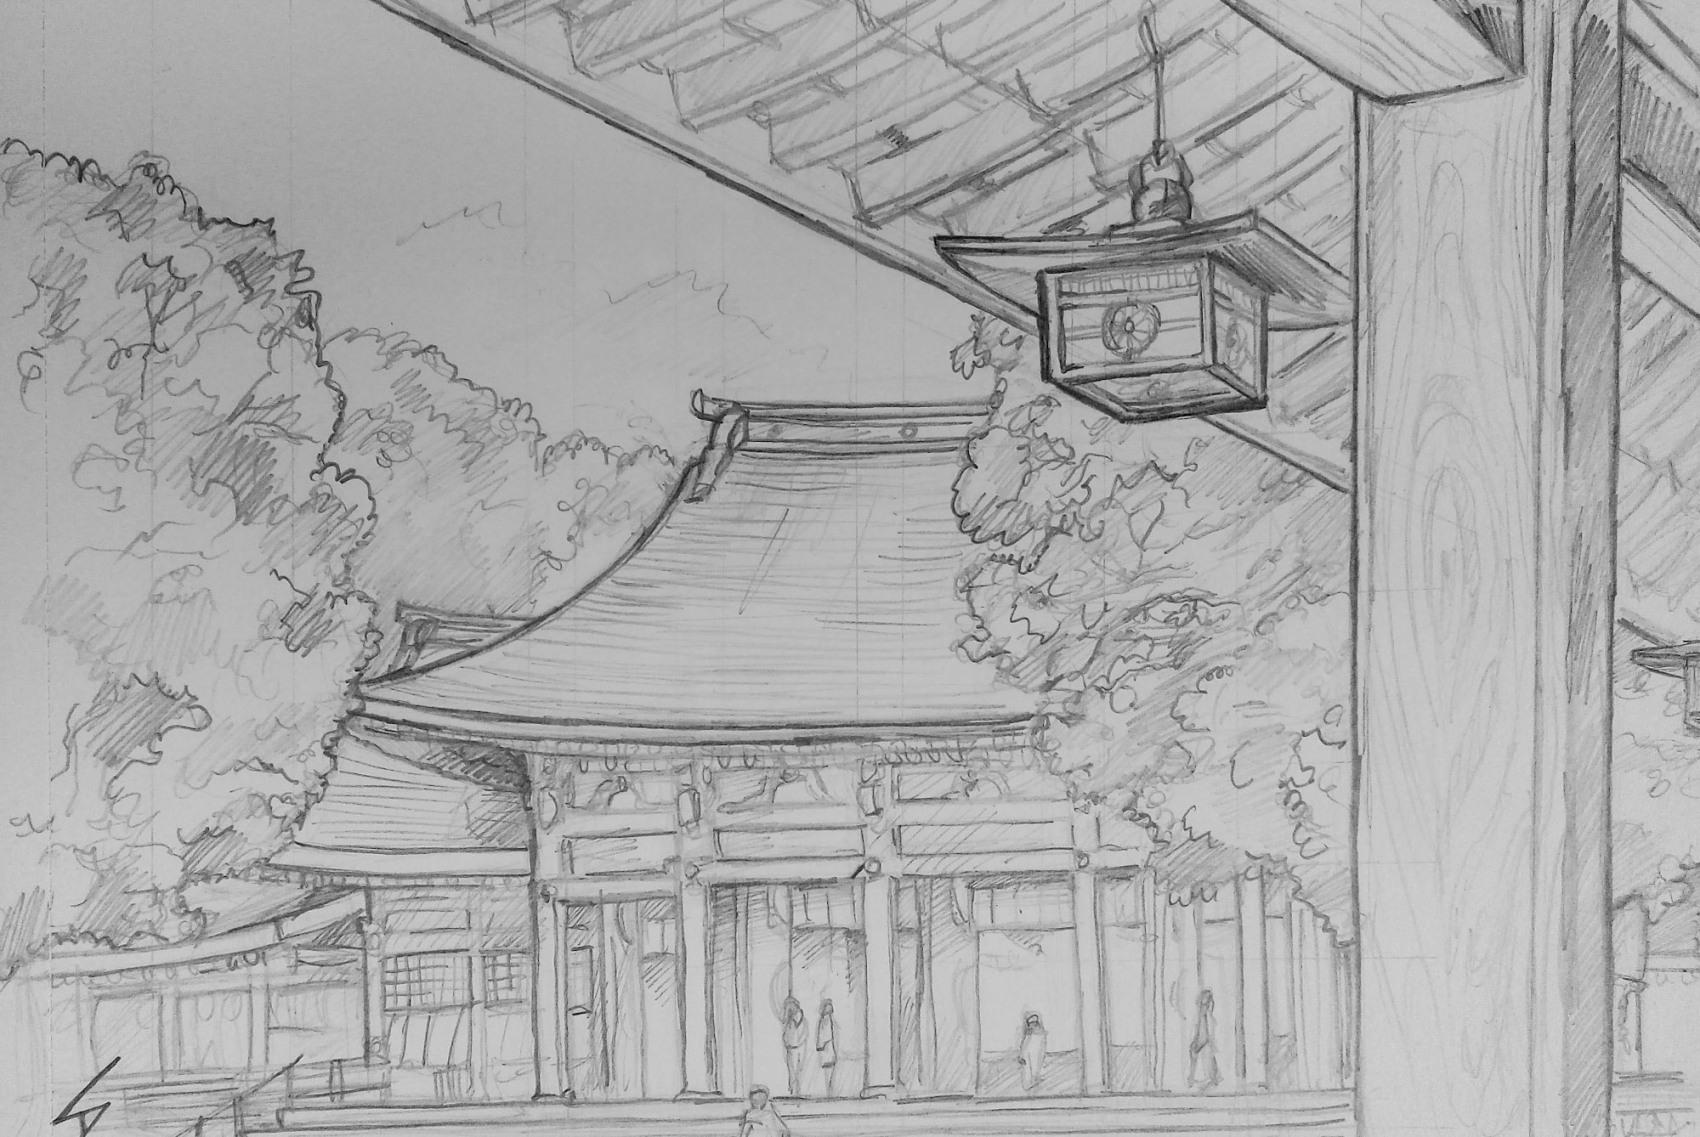 Urban art – Shibuya, Tokyo, Japan. 'Meiji Shrine.' Artwork from my travel art blog article 'Sakura Japan.' sketchbookexplorer.com @davidasutton @sketchbookexplorer Facebook.com/davidanthonysutton #sketch #drawing #art #japan #tokyo #meijishrine #samurai #meiji #travel #travelblog #cherryblossom #cherryblossomseason